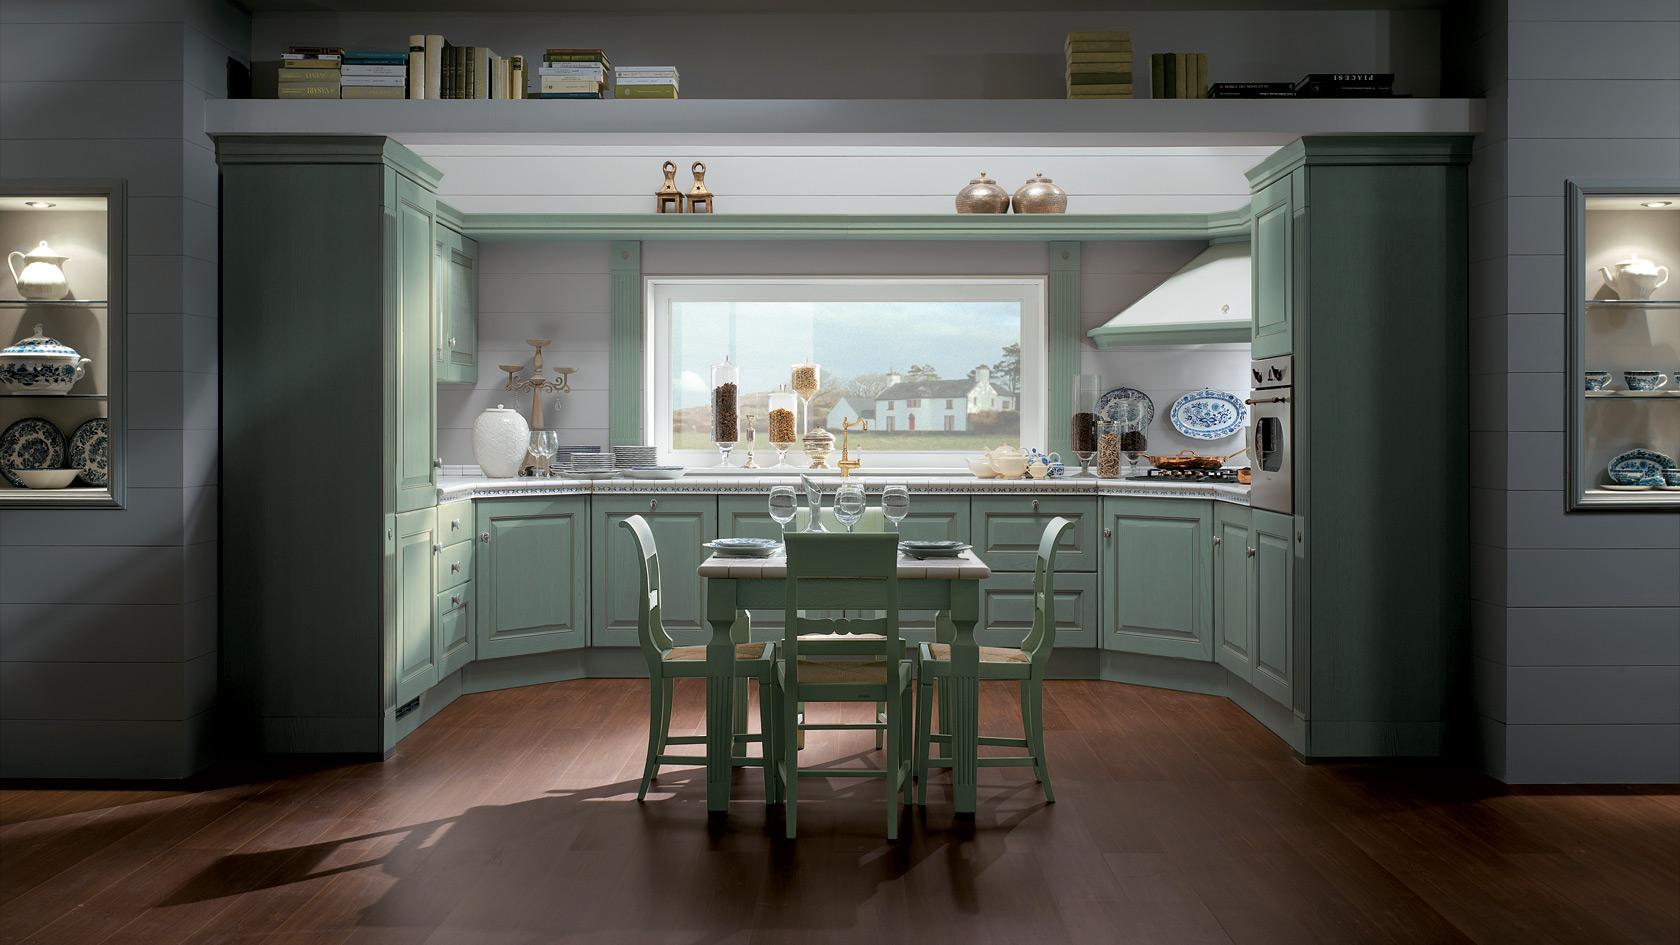 Catalogo cucine scavolini 2014 8 design mon amour for Catalogo cucine